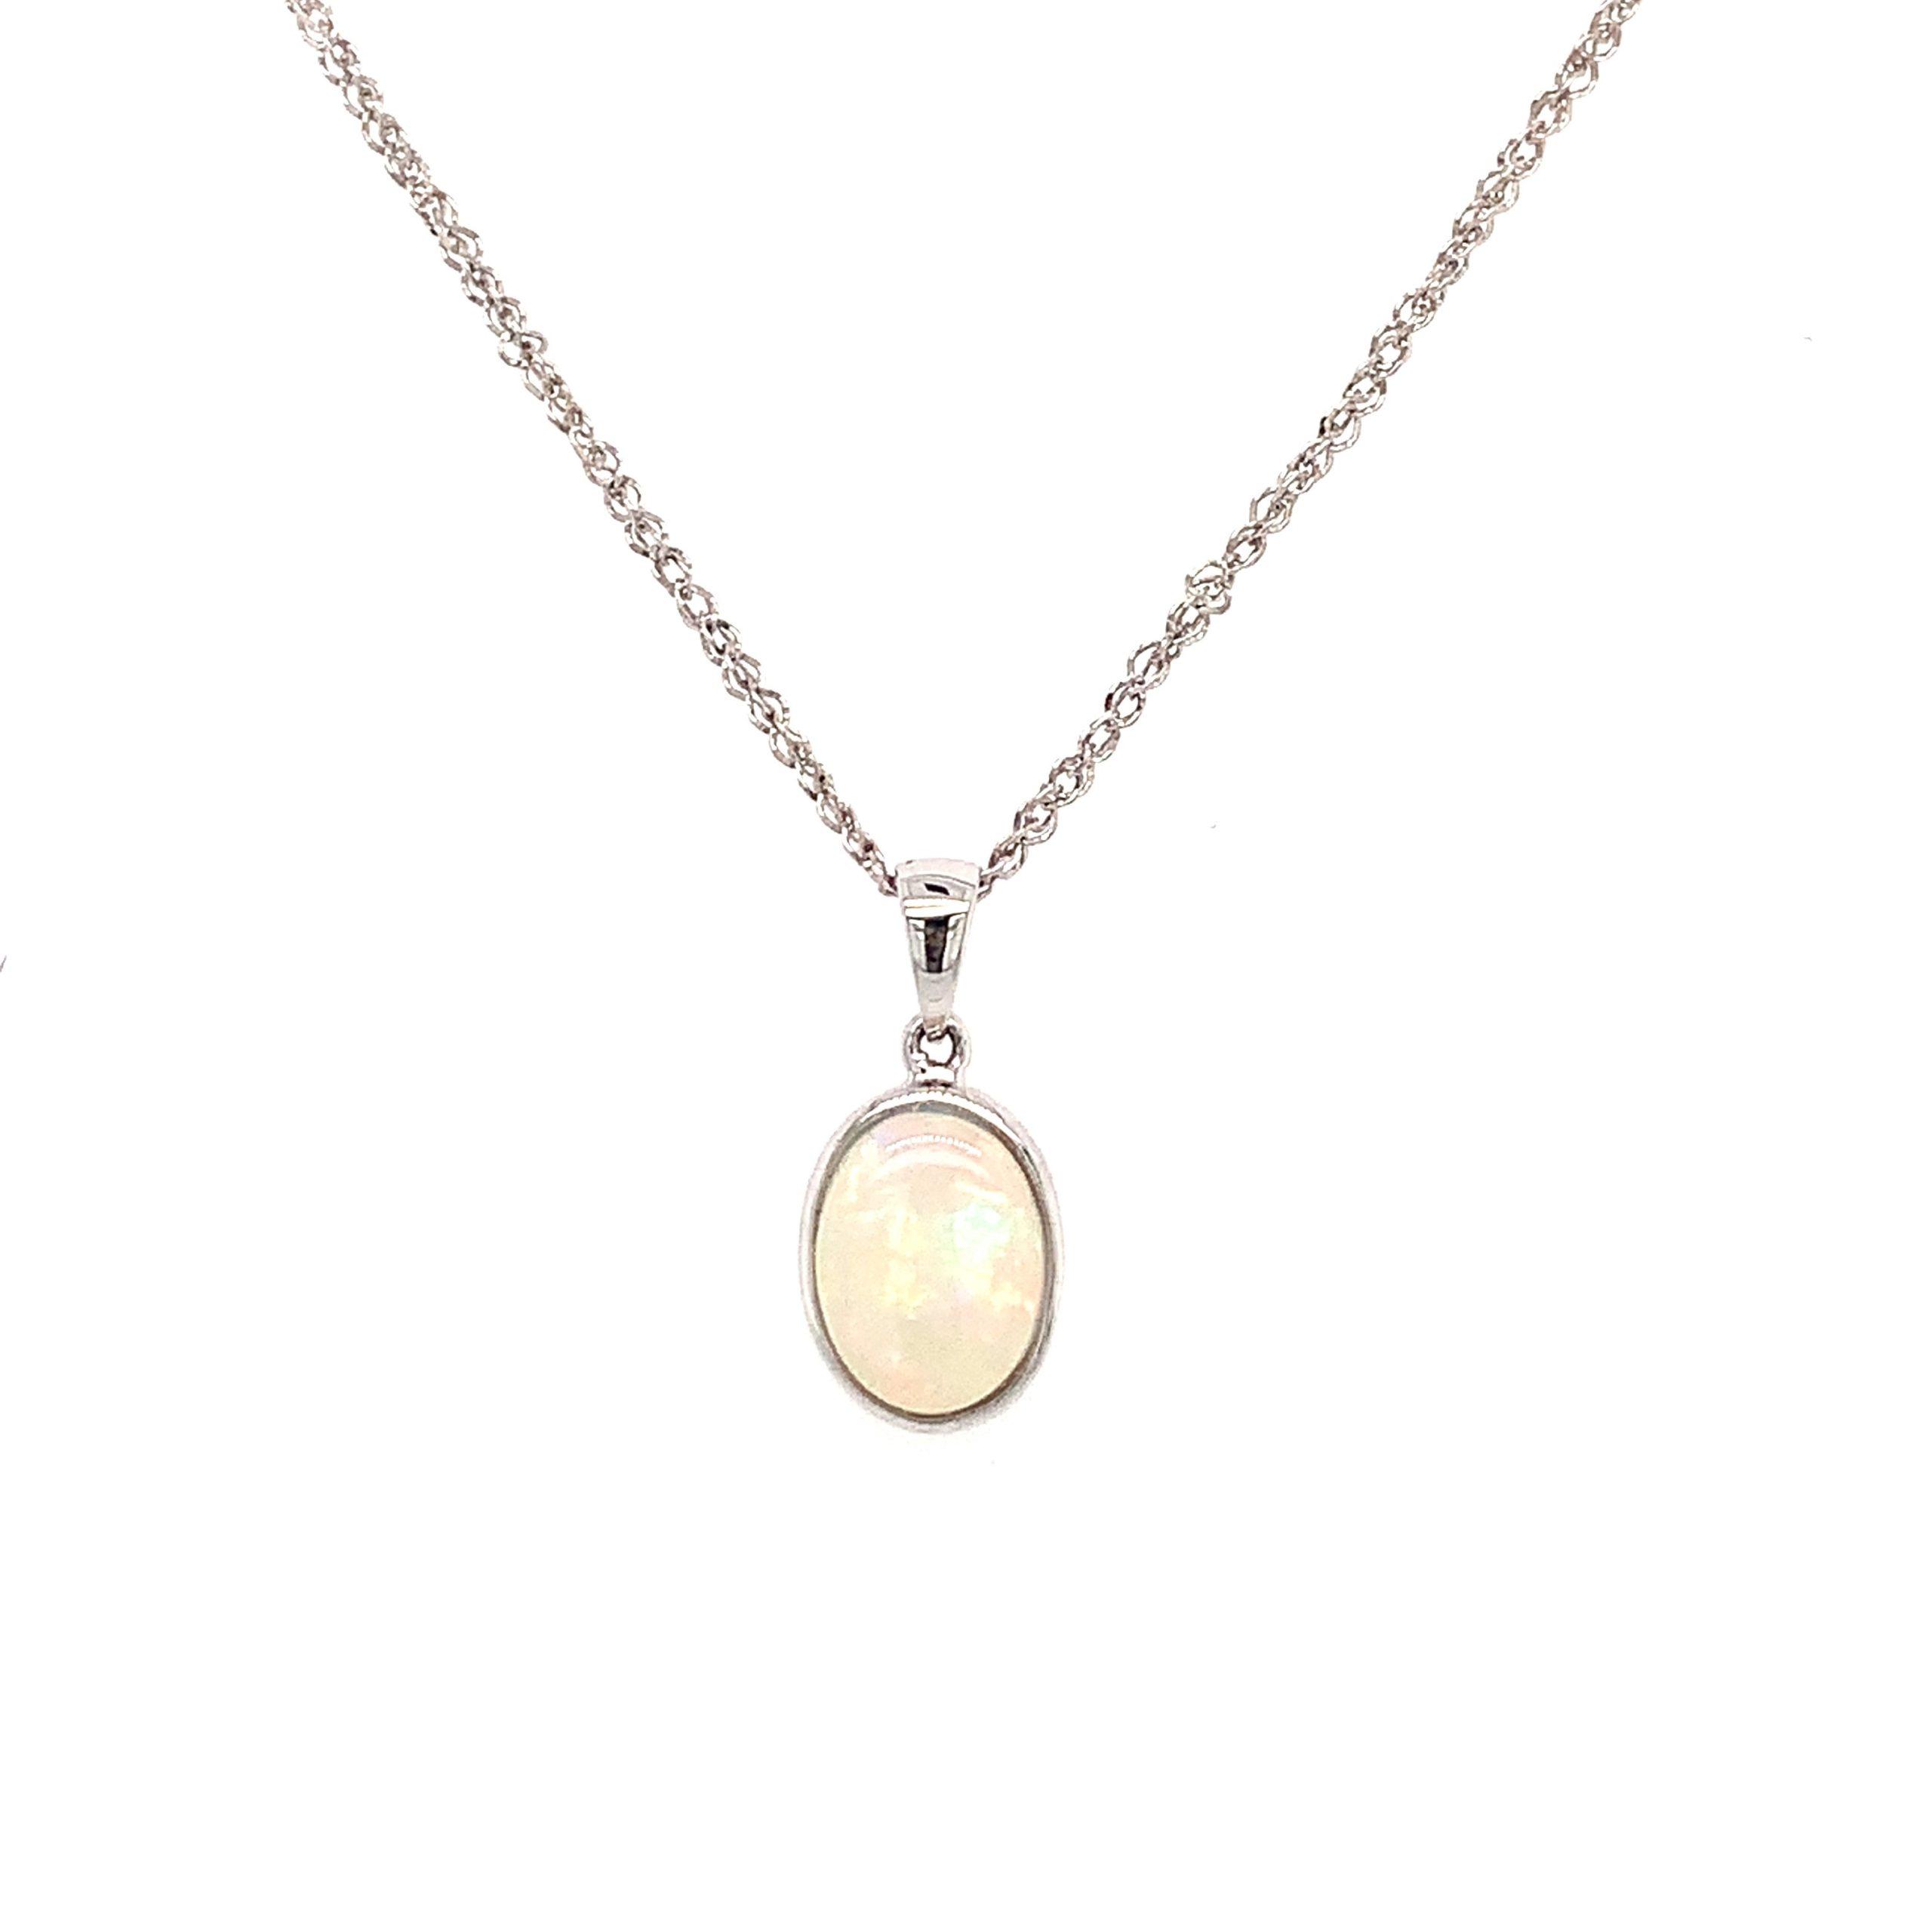 White Gold Bezel-Set Opal Pendant